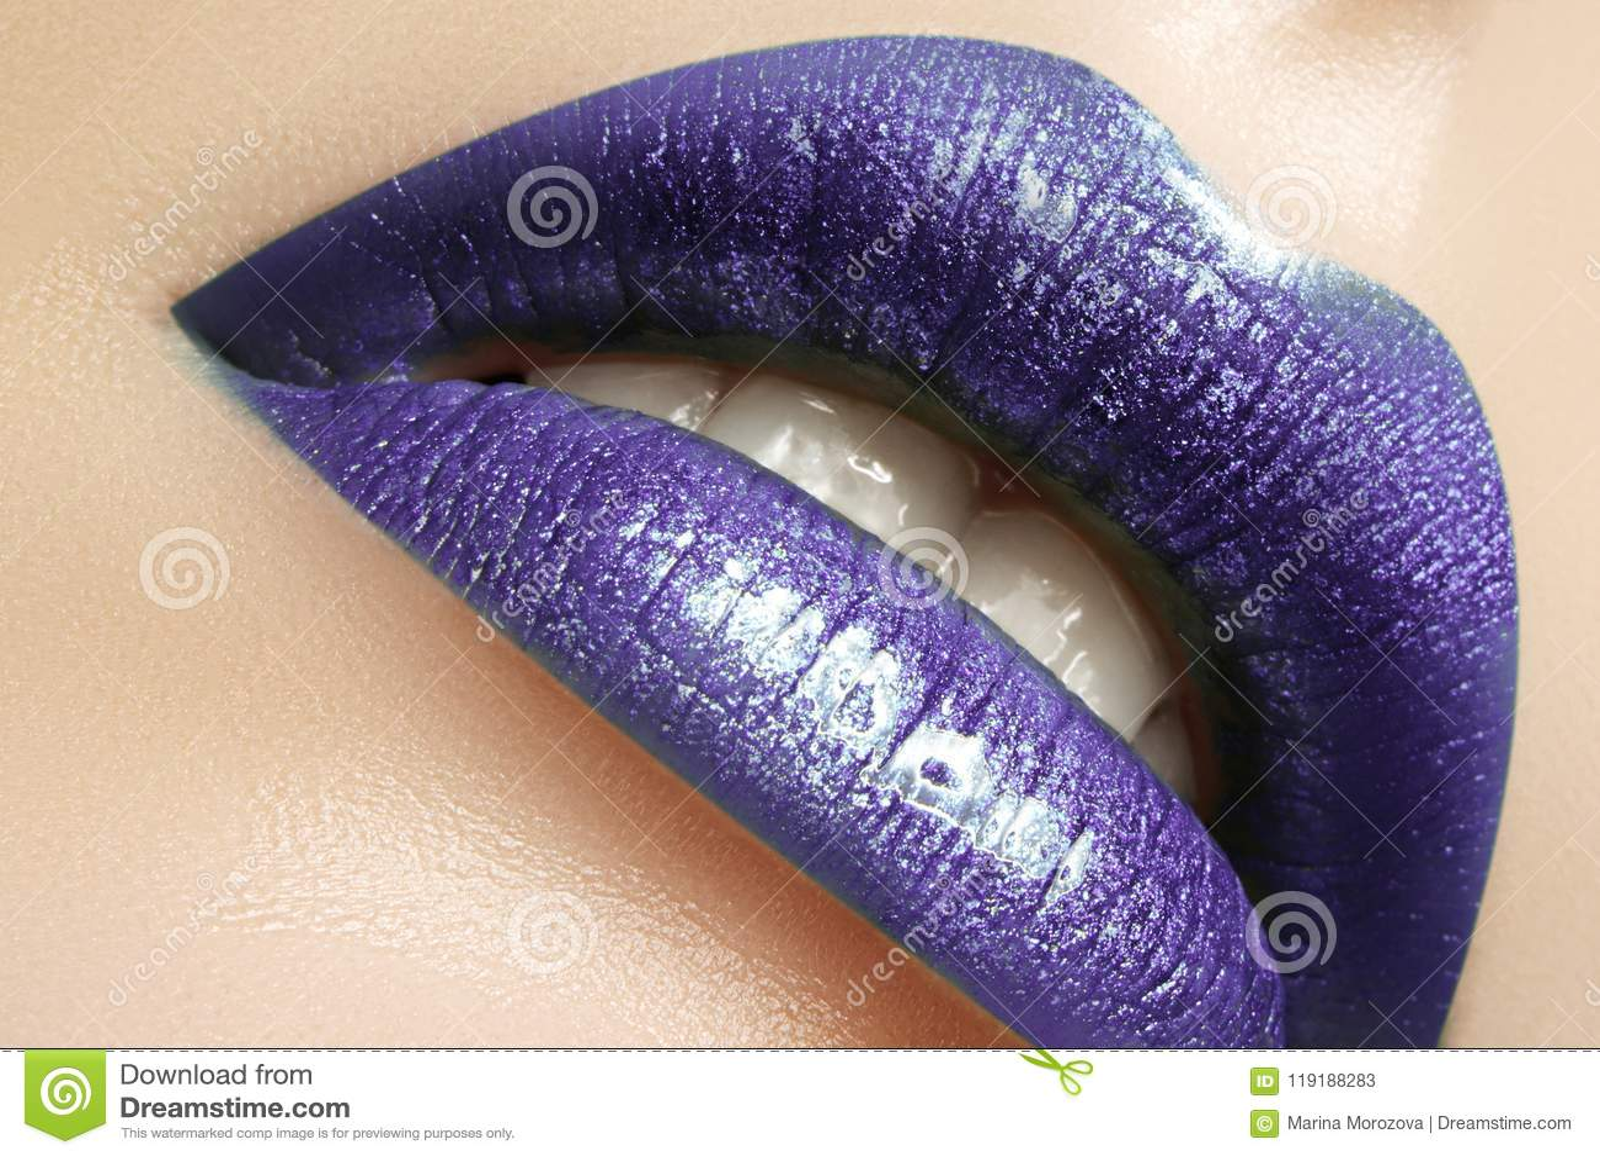 Zauber-Glanz-Lippenmake-up Modemake-upschönheitsschuß Nahaufnahme-sexy volle Lippen mit feiern purpurrotes Lipgloss